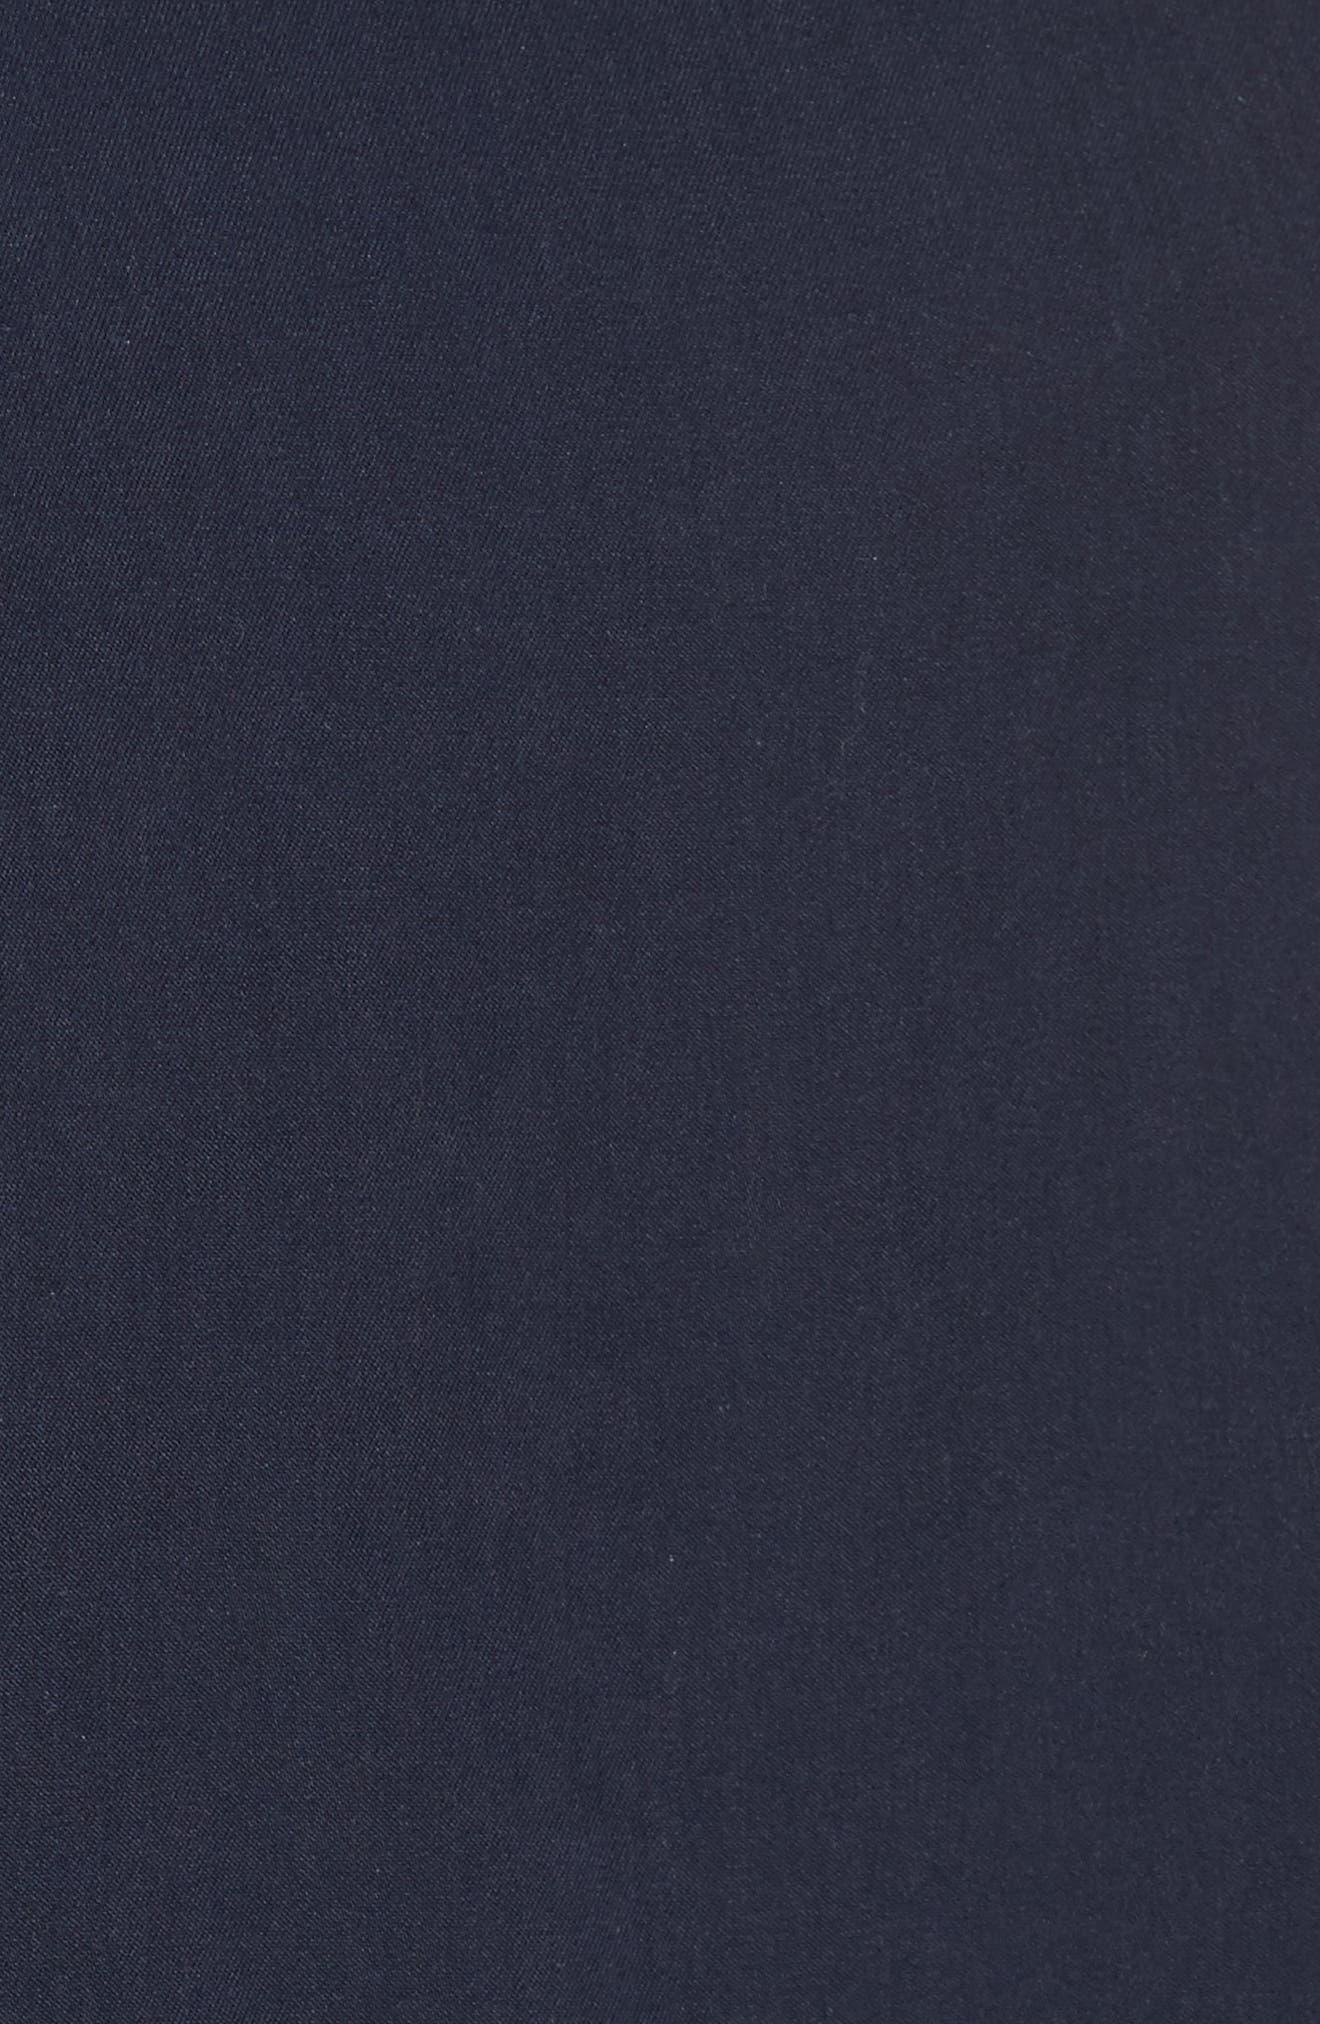 Harrington Bomber Jacket,                             Alternate thumbnail 5, color,                             Navy Captain